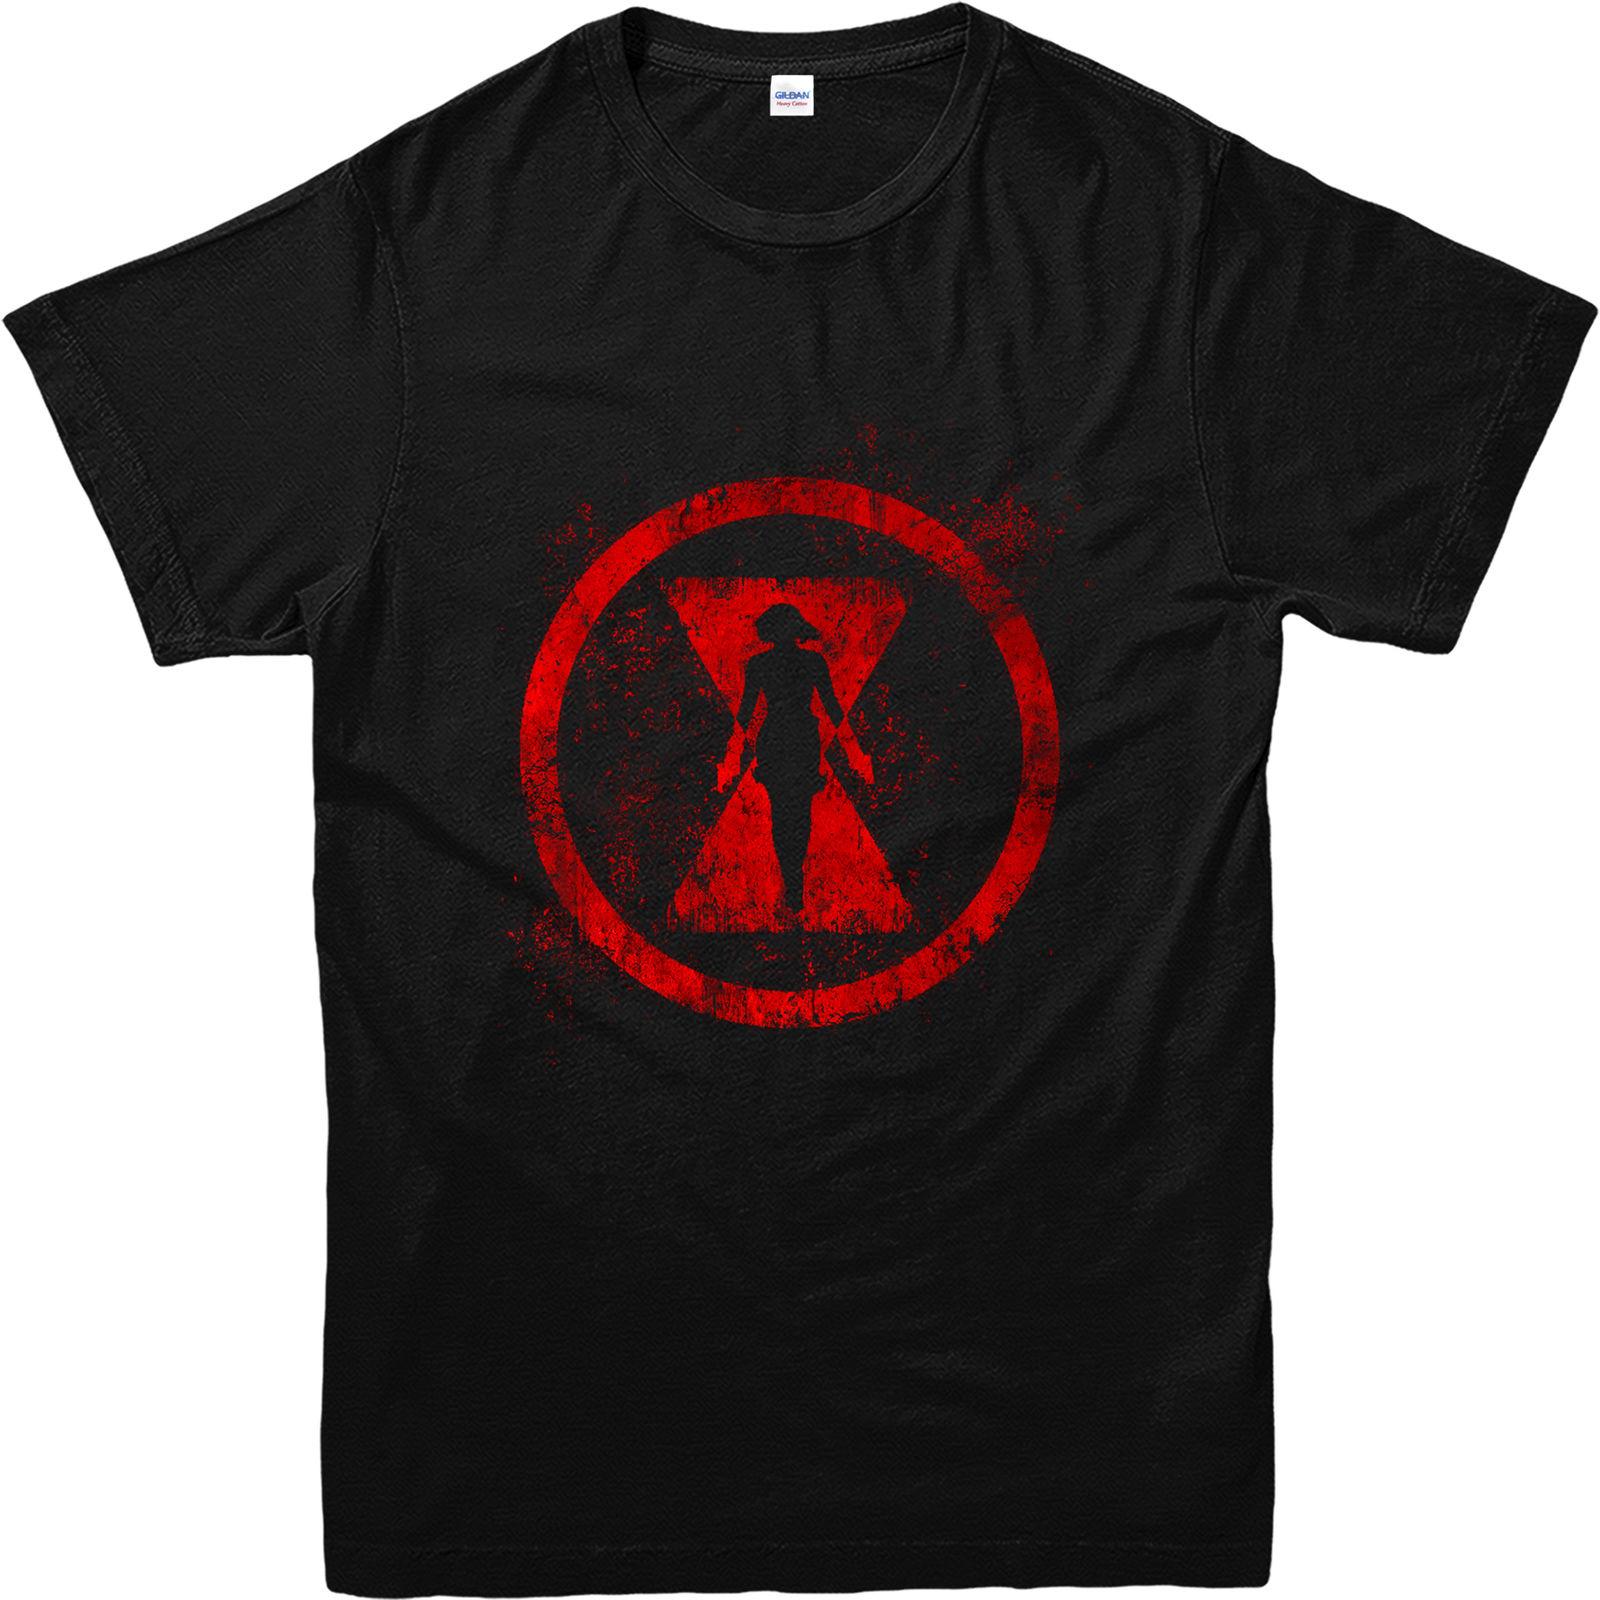 Black Widow T-Shirt, Avengers, Marvel Comics InspiRed Design Print Tee Shirts